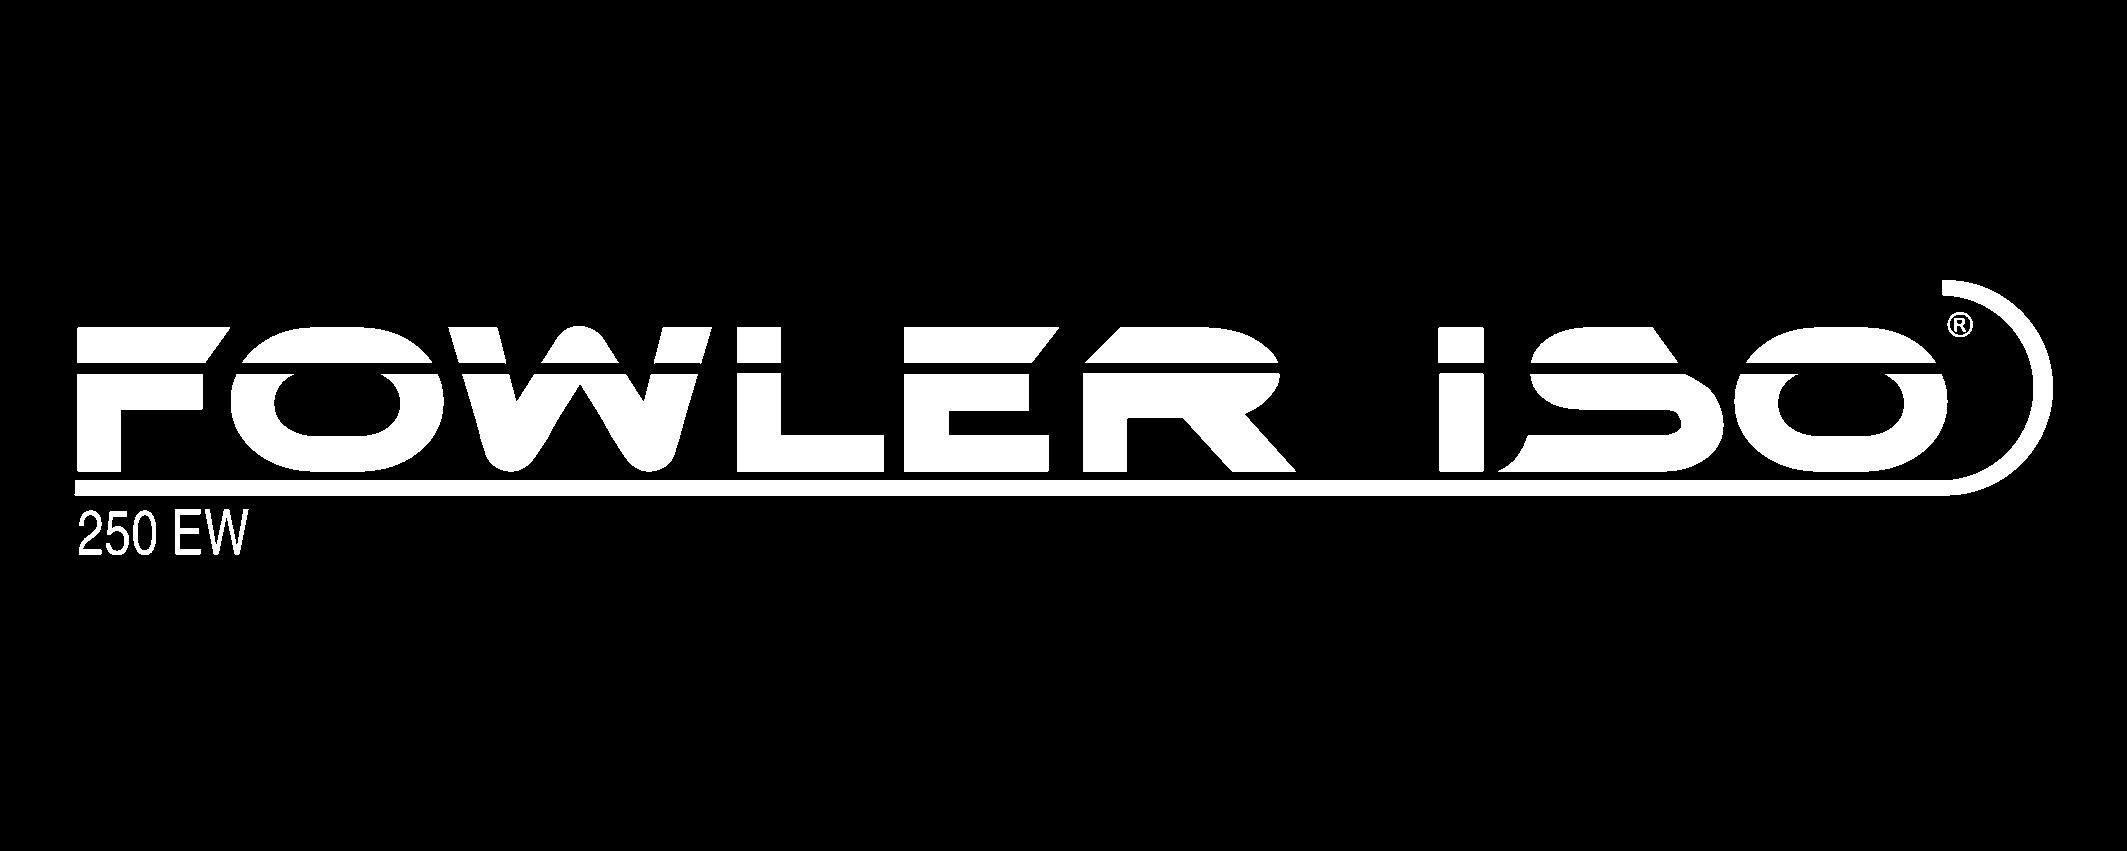 FOWLER-ISO-White